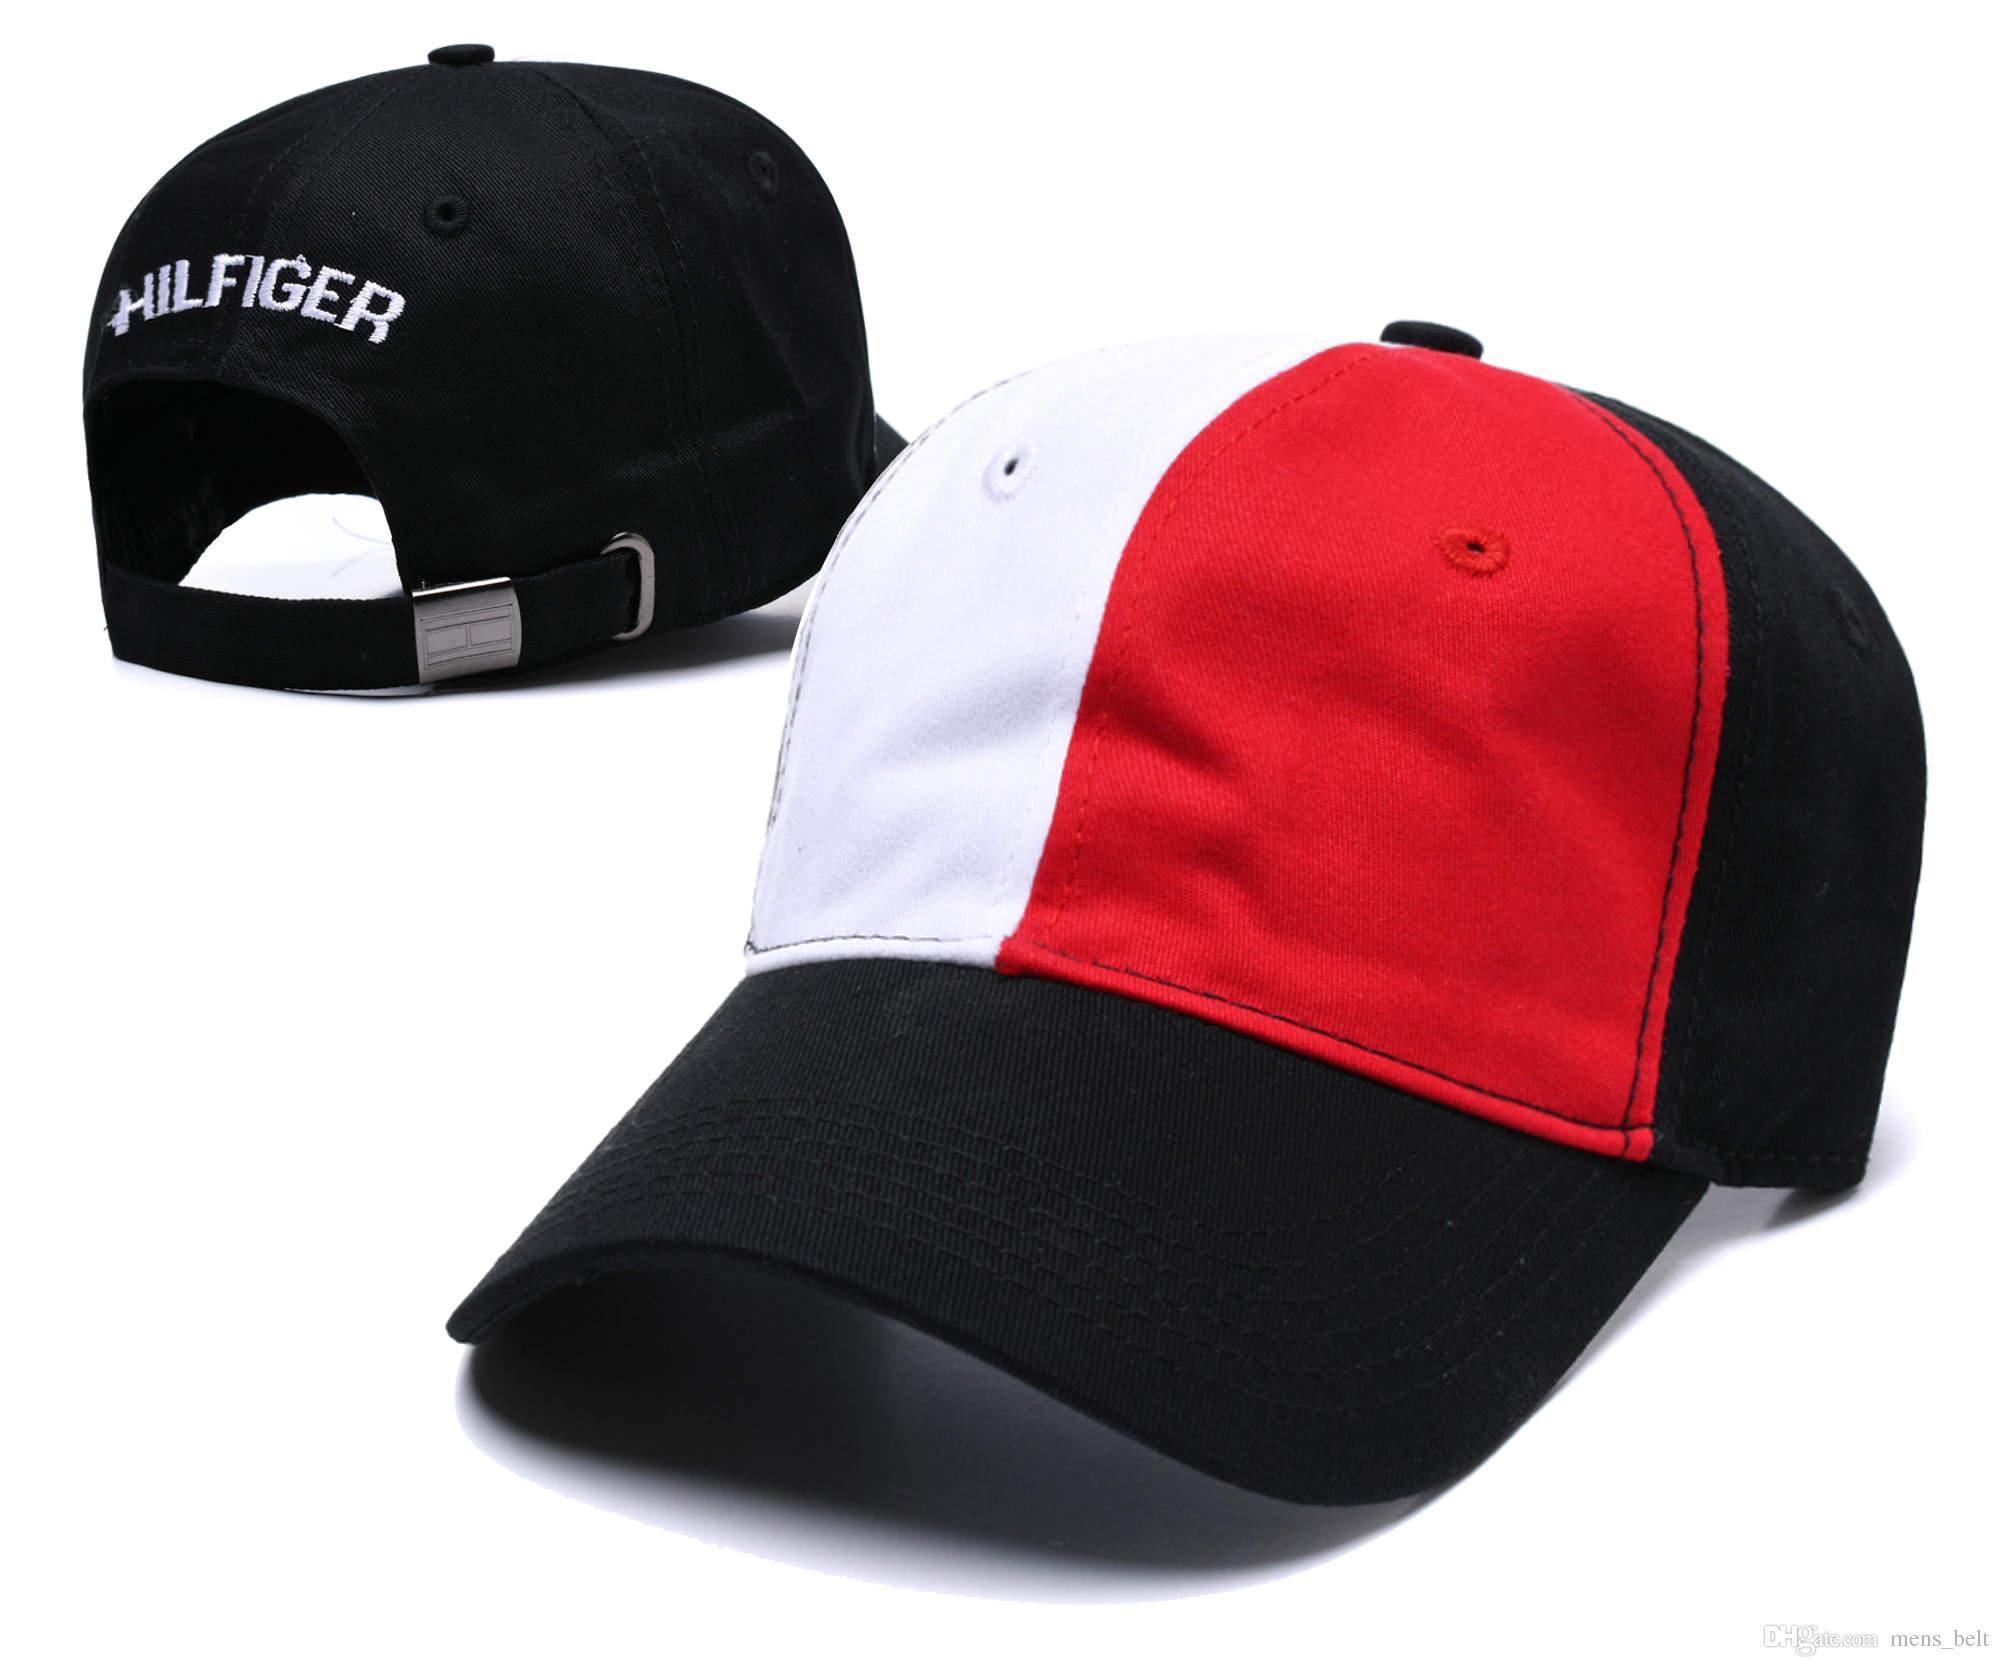 78a430757d9 2019 New Fashion Hats Brand Hundreds Tha Alumni Strap Back Cap Men ...